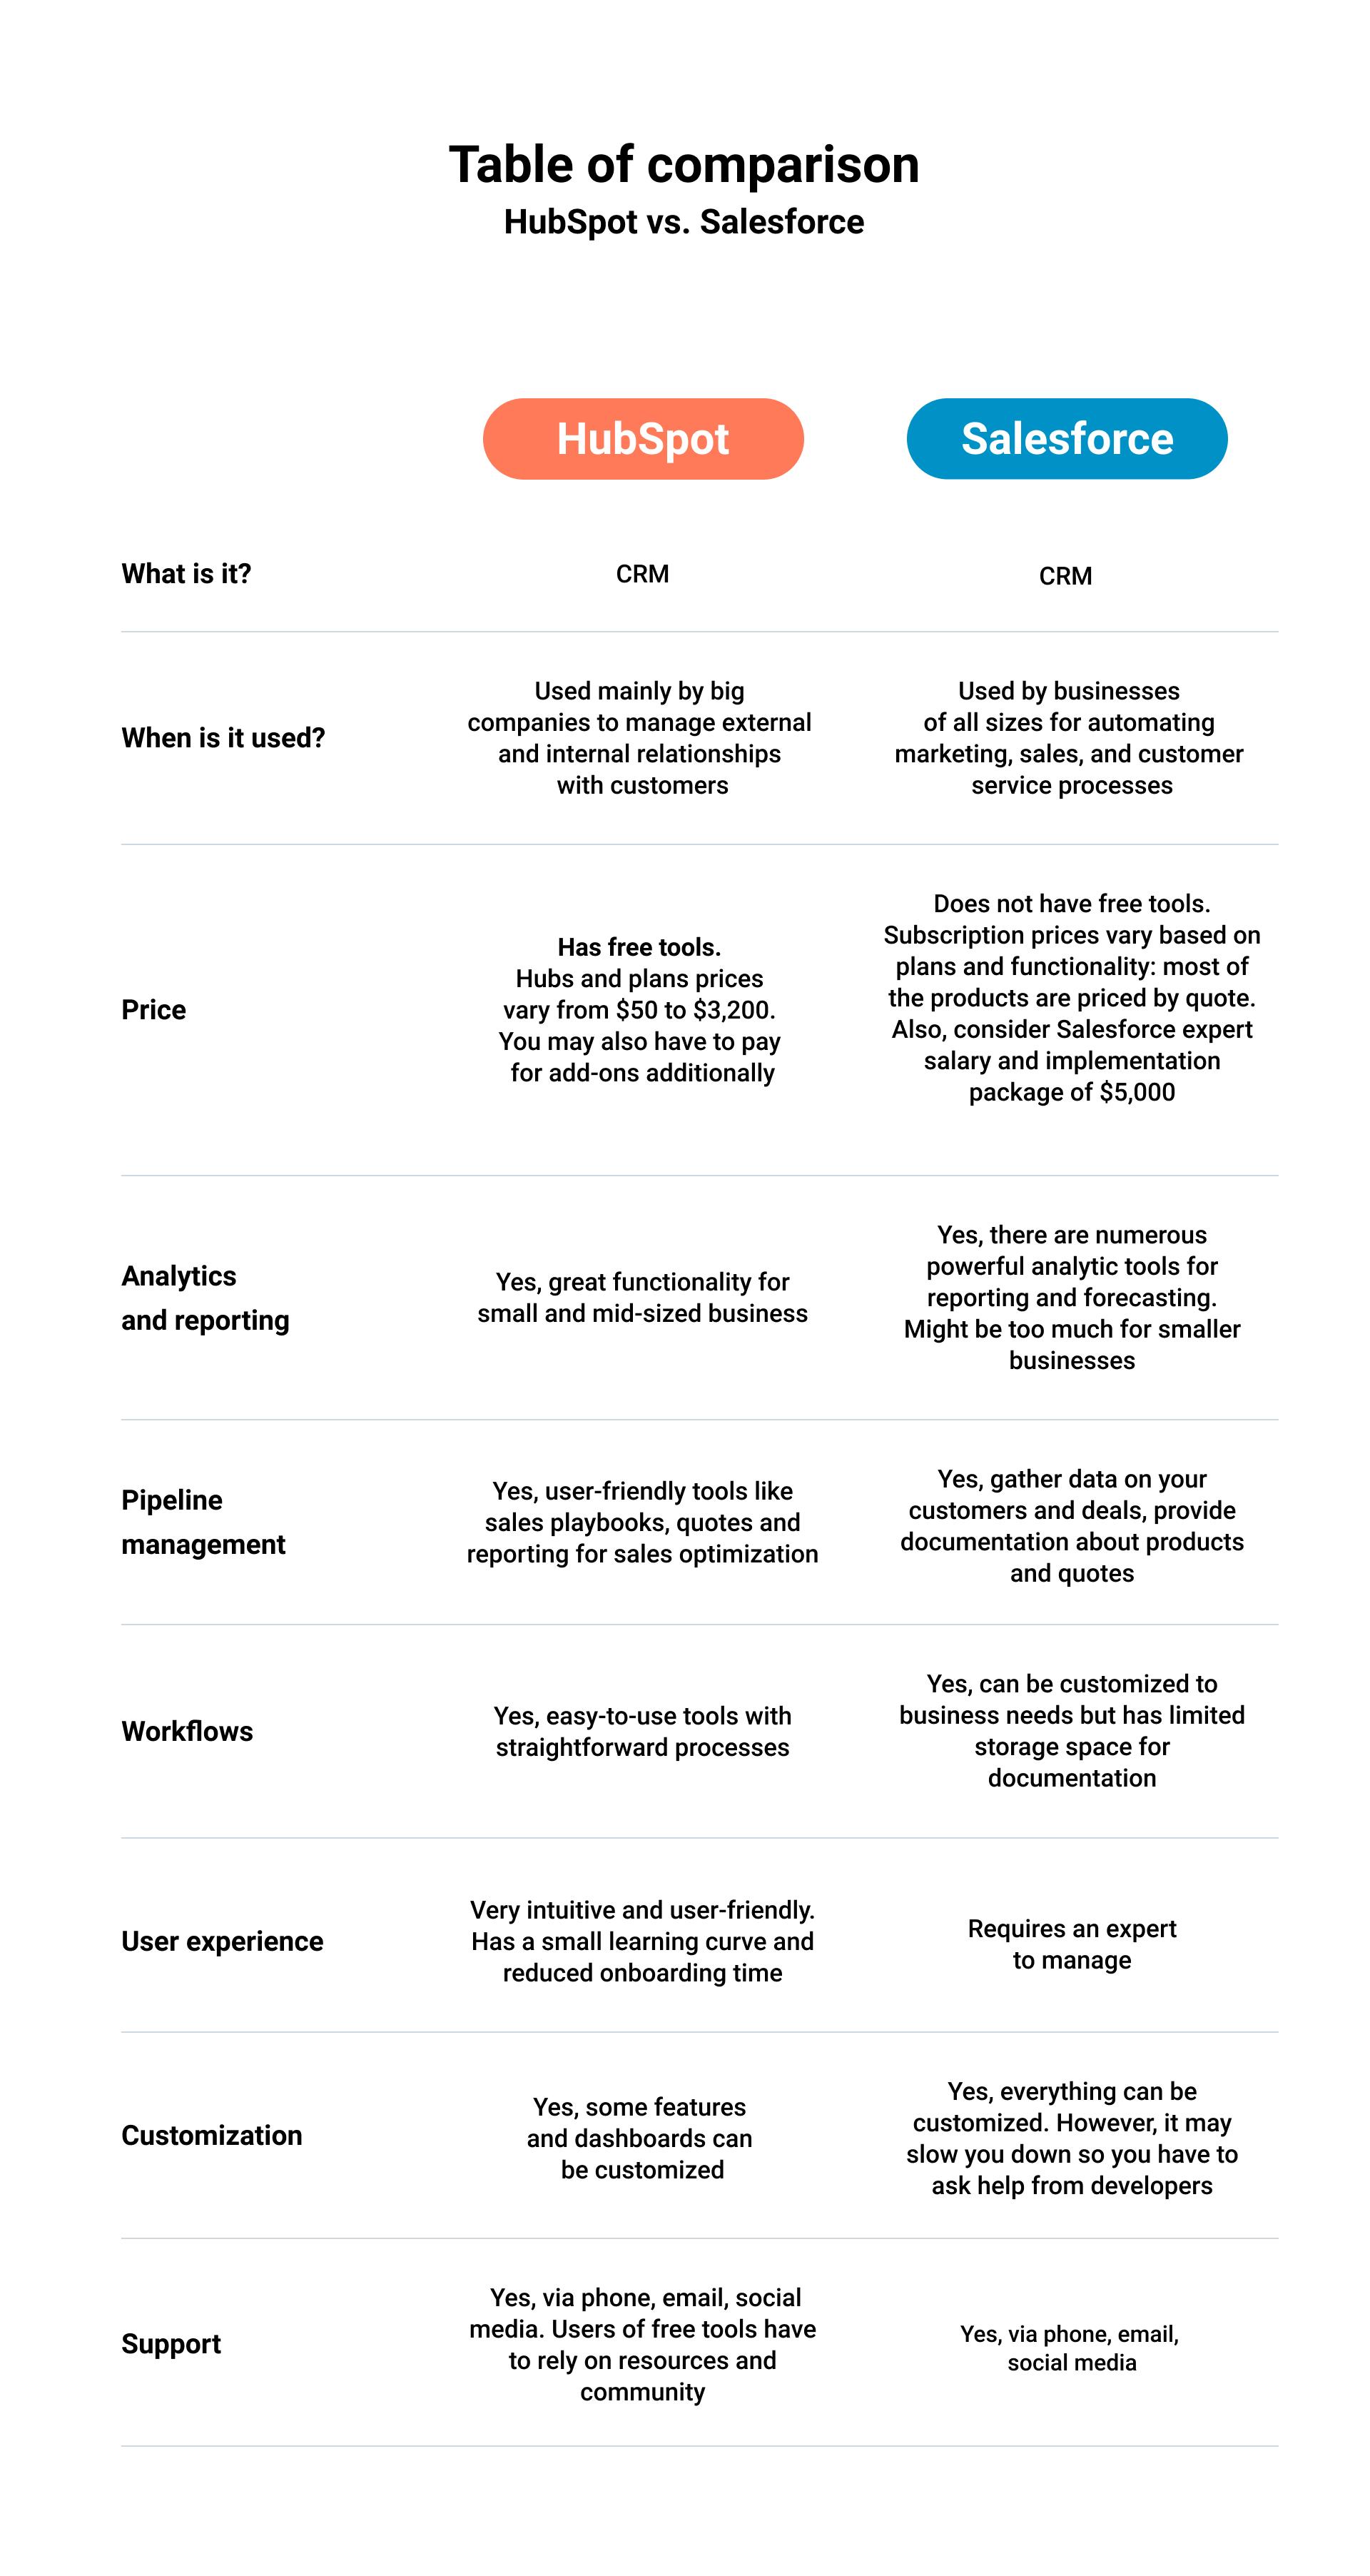 hubspot vs salesforce table of comparison